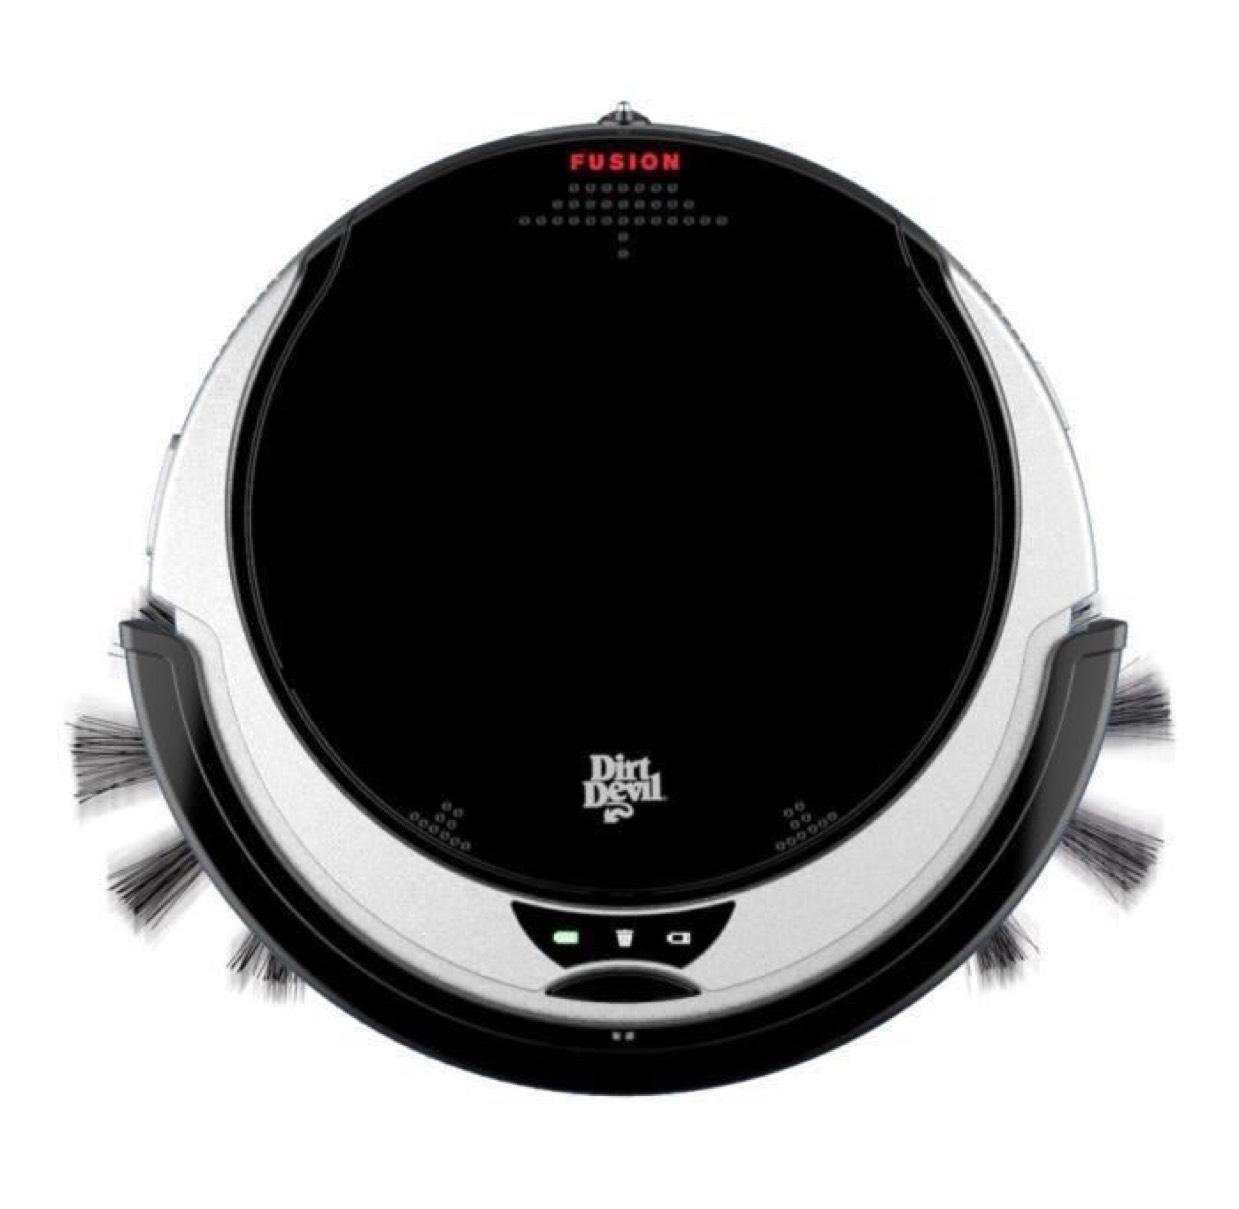 [CDAV] Aspirateur Robot Dirt Devil Fusion M611 (via ODR 20€)